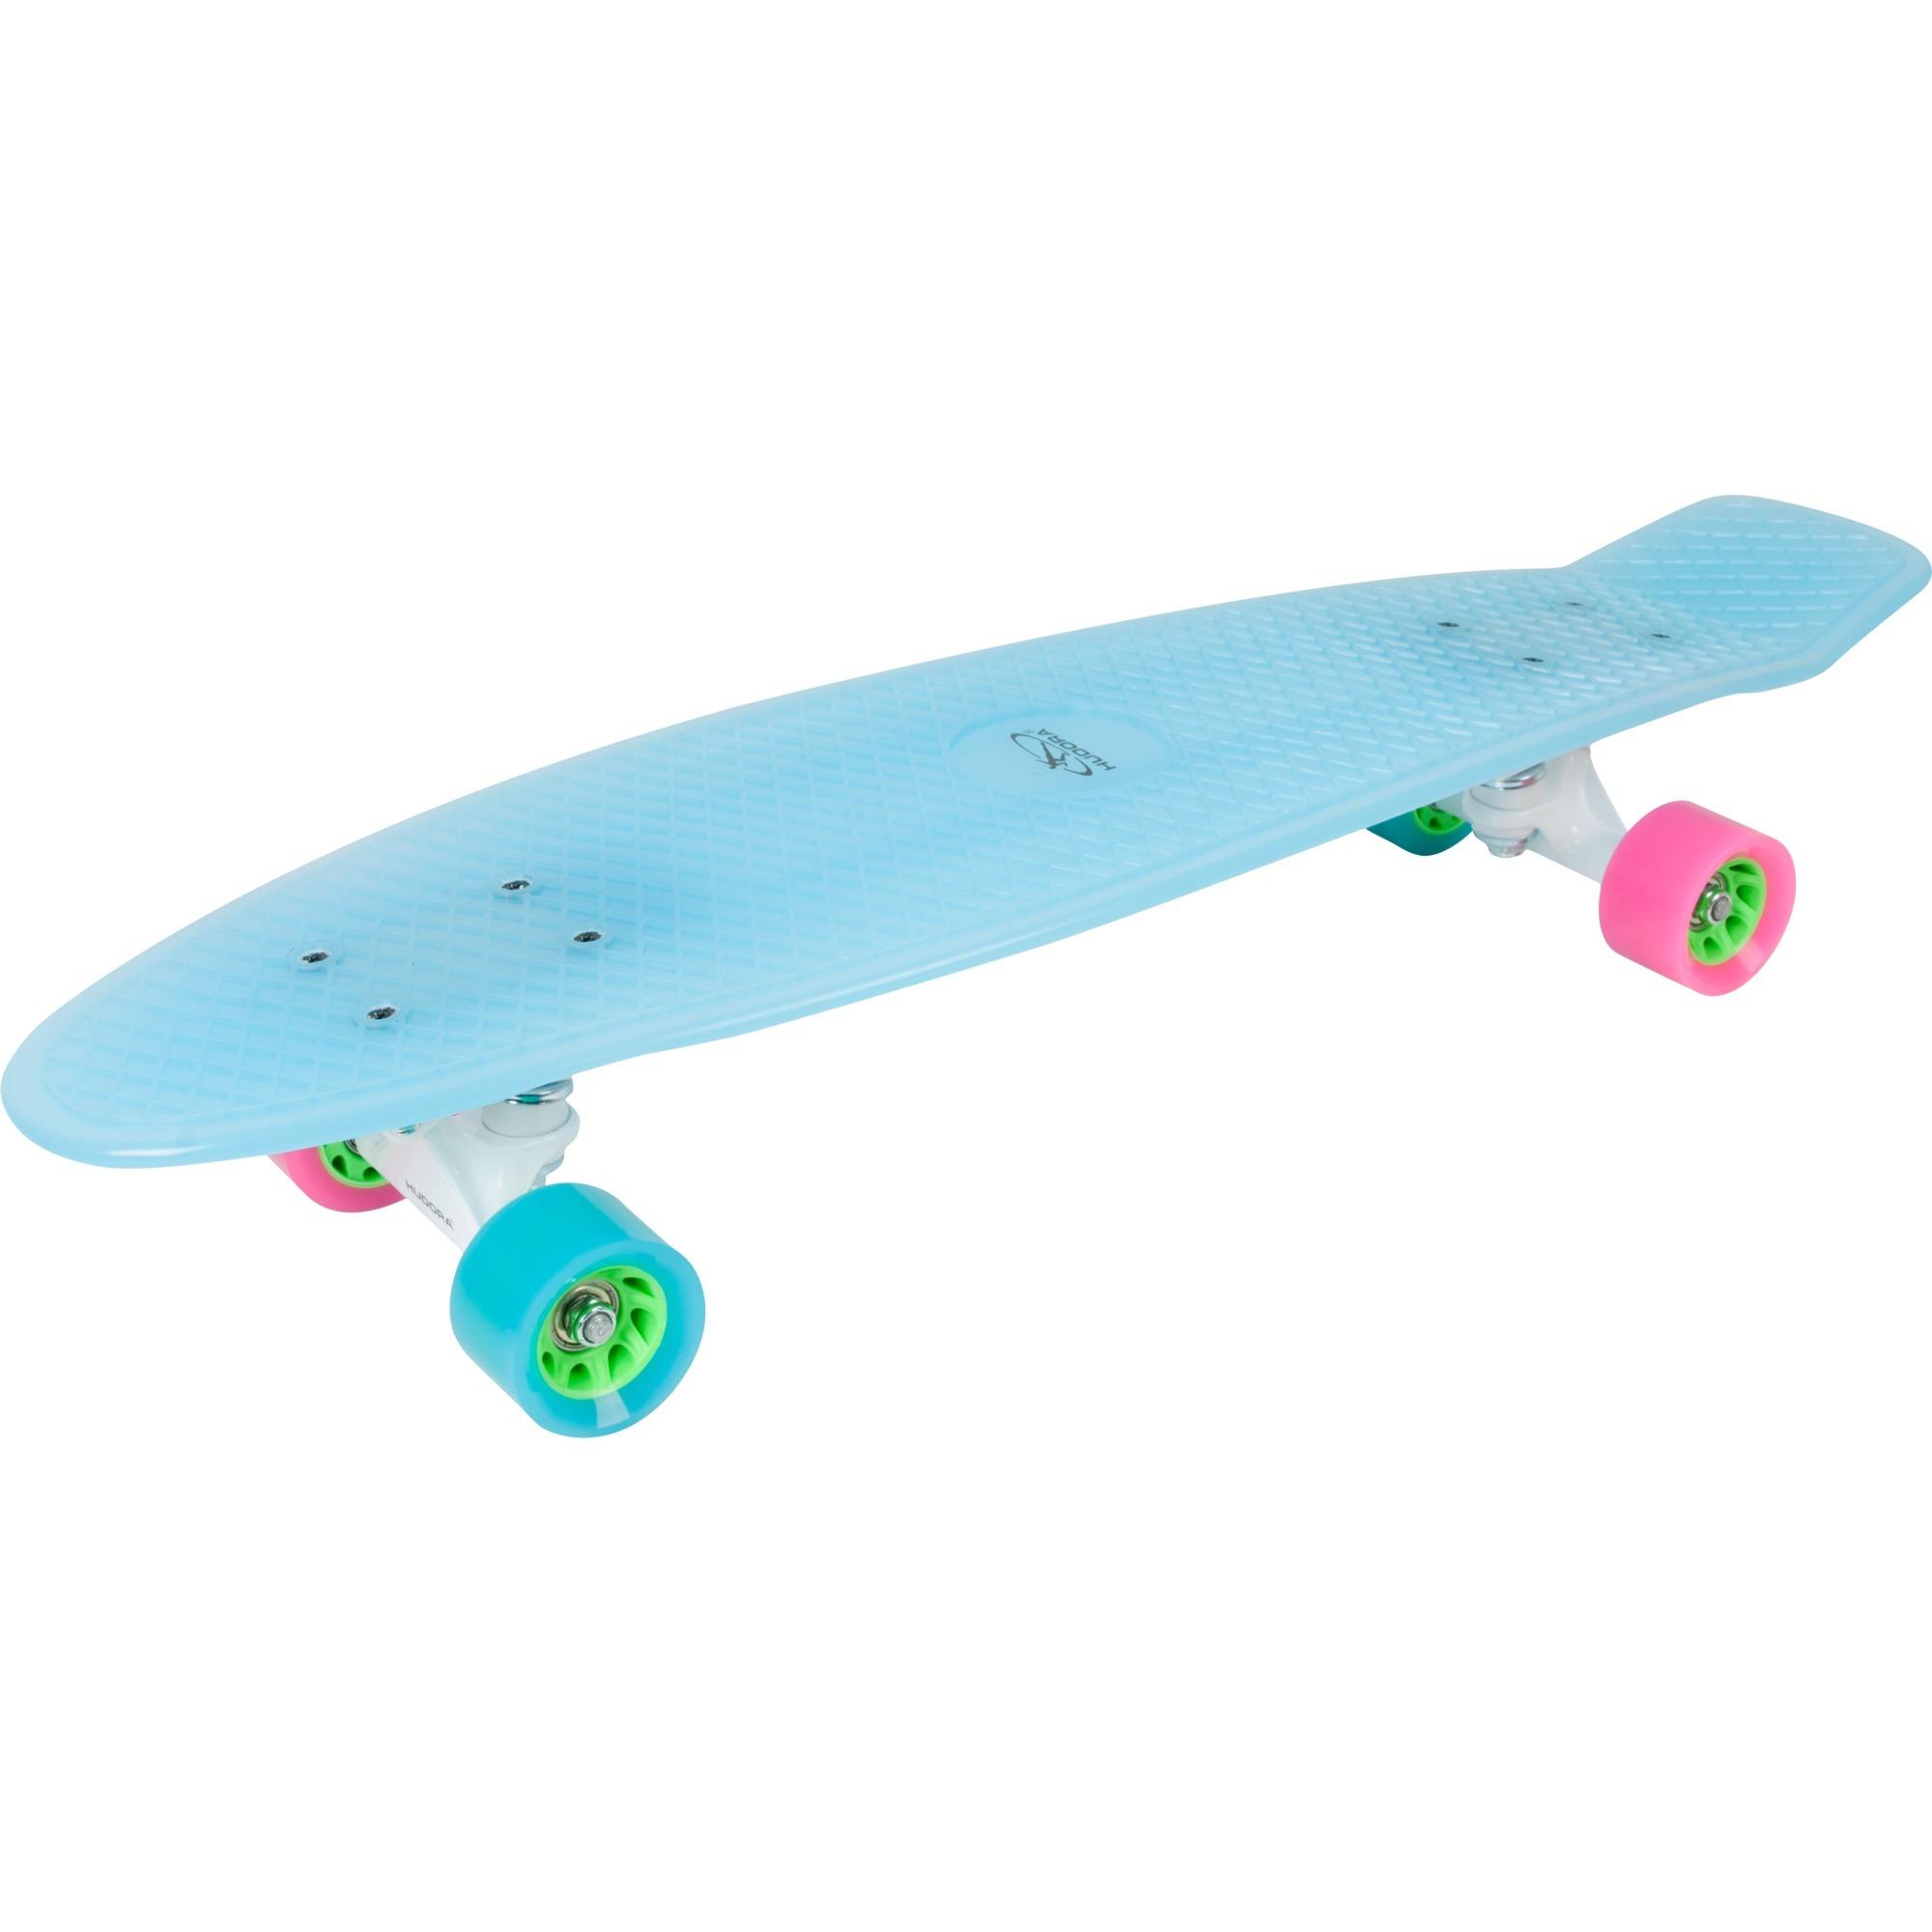 12144, Skateboard